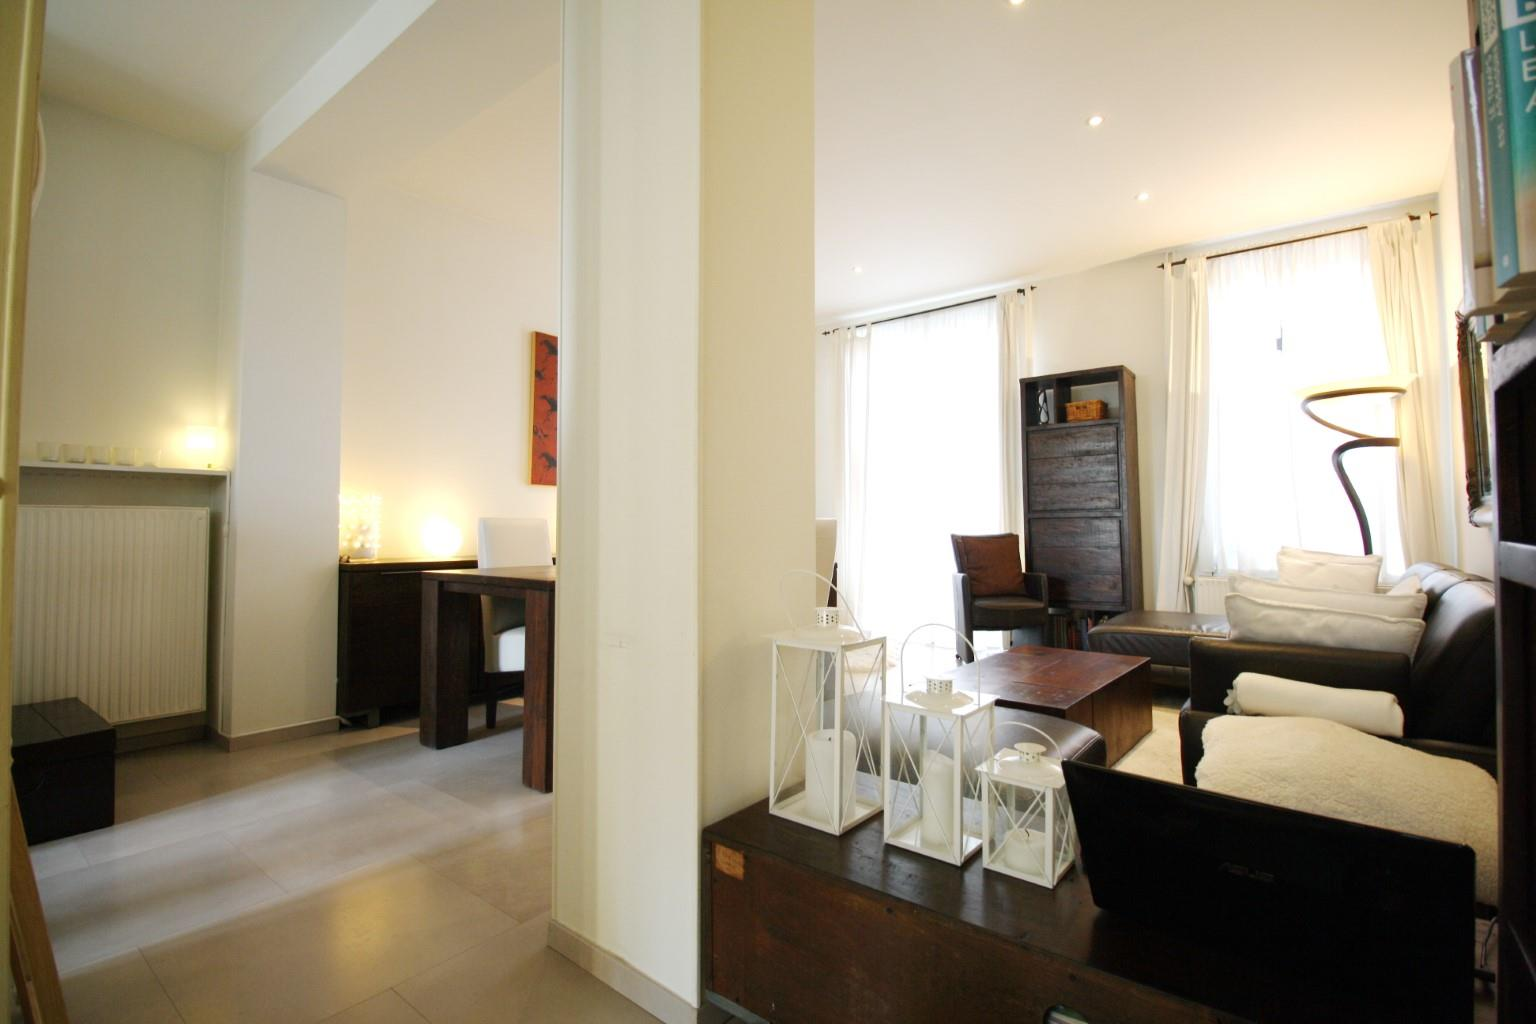 Maison - Laeken - #3014834-0